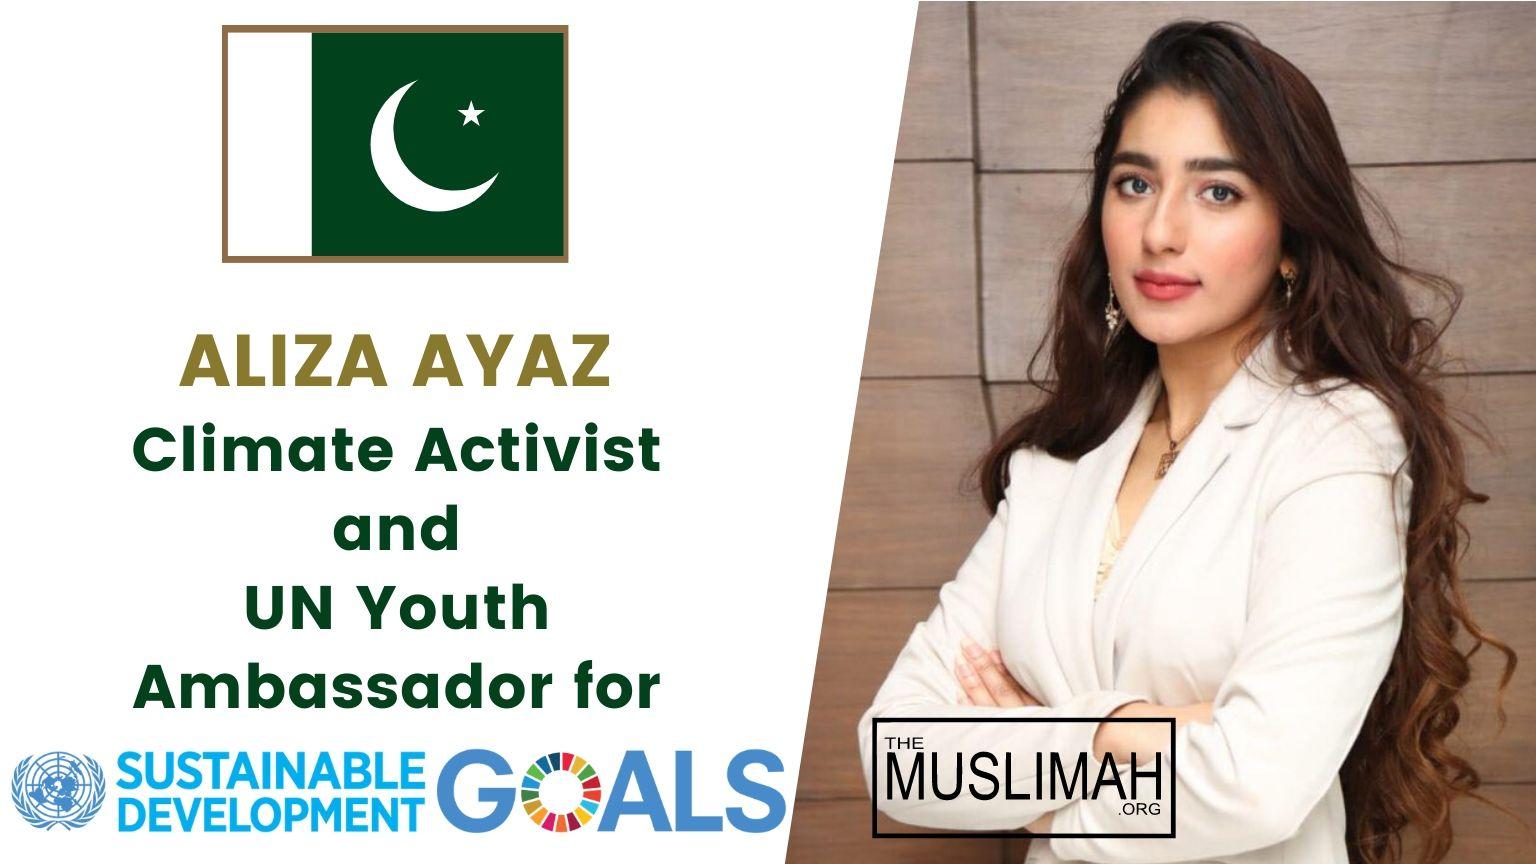 🇵🇰 Aliza Ayaz | 🇺🇳 UN Youth Ambassador for Sustainable Development Goals